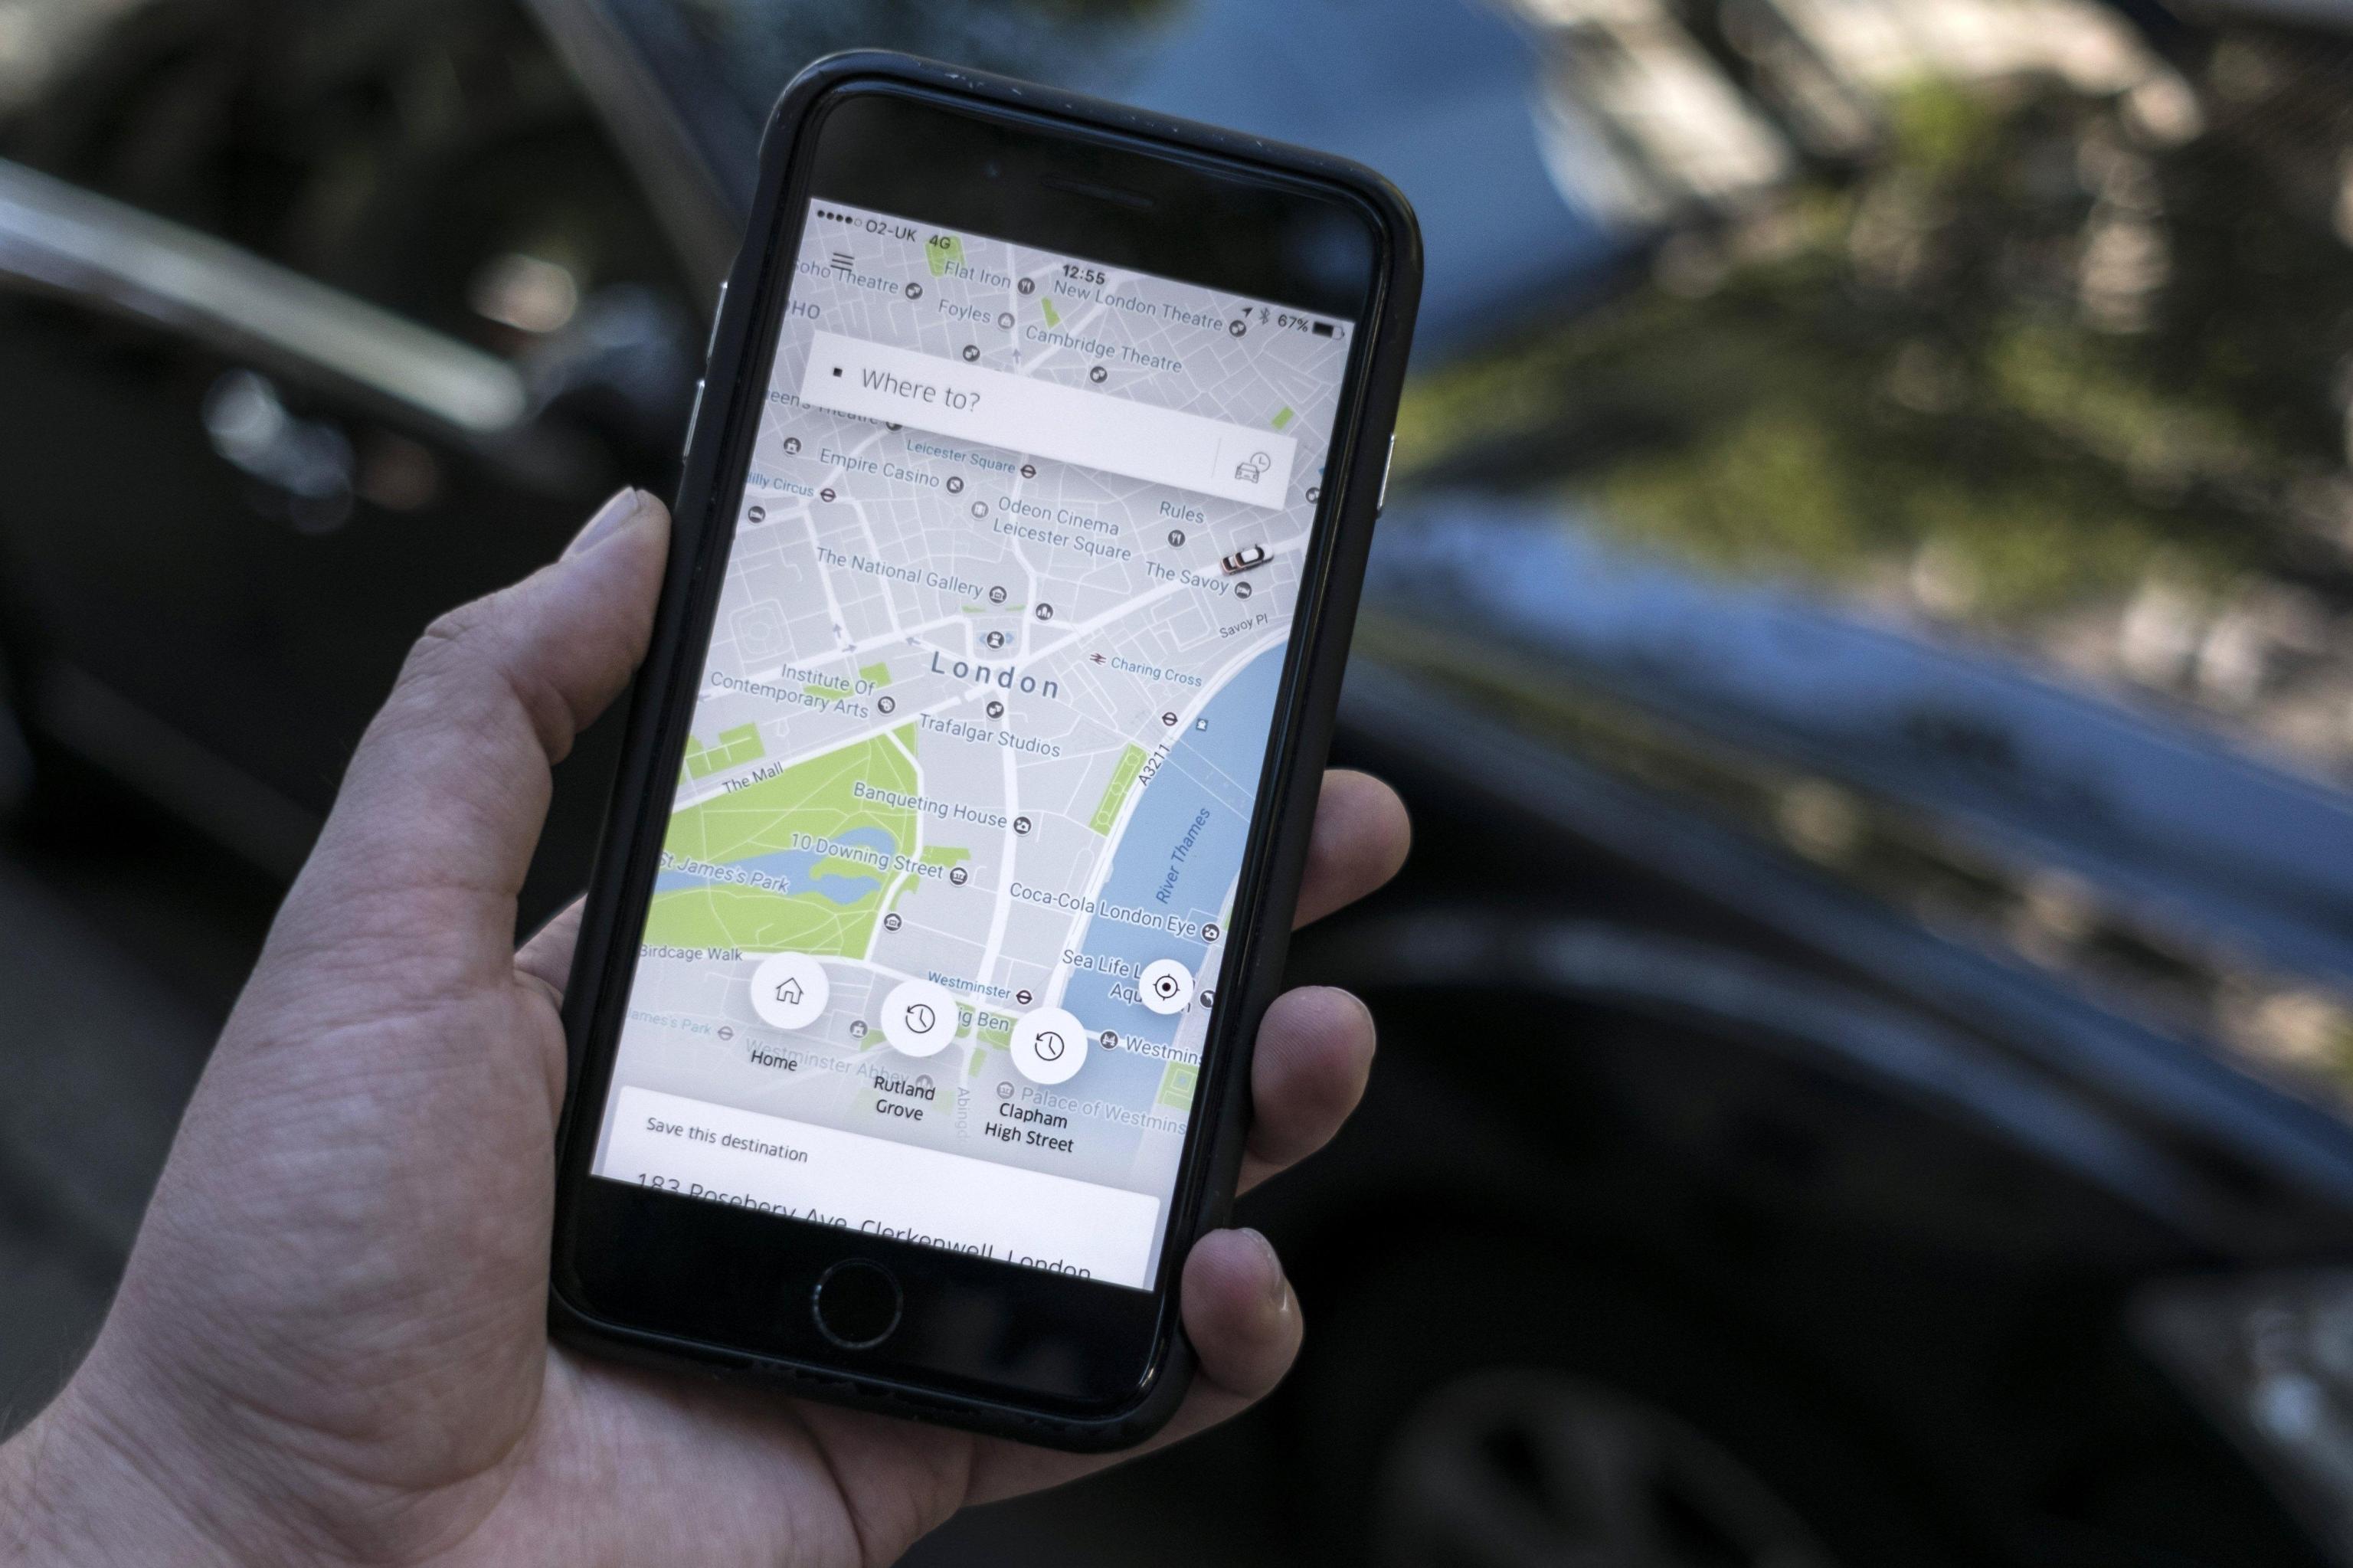 UberEats verso 3 mld dollari vendite